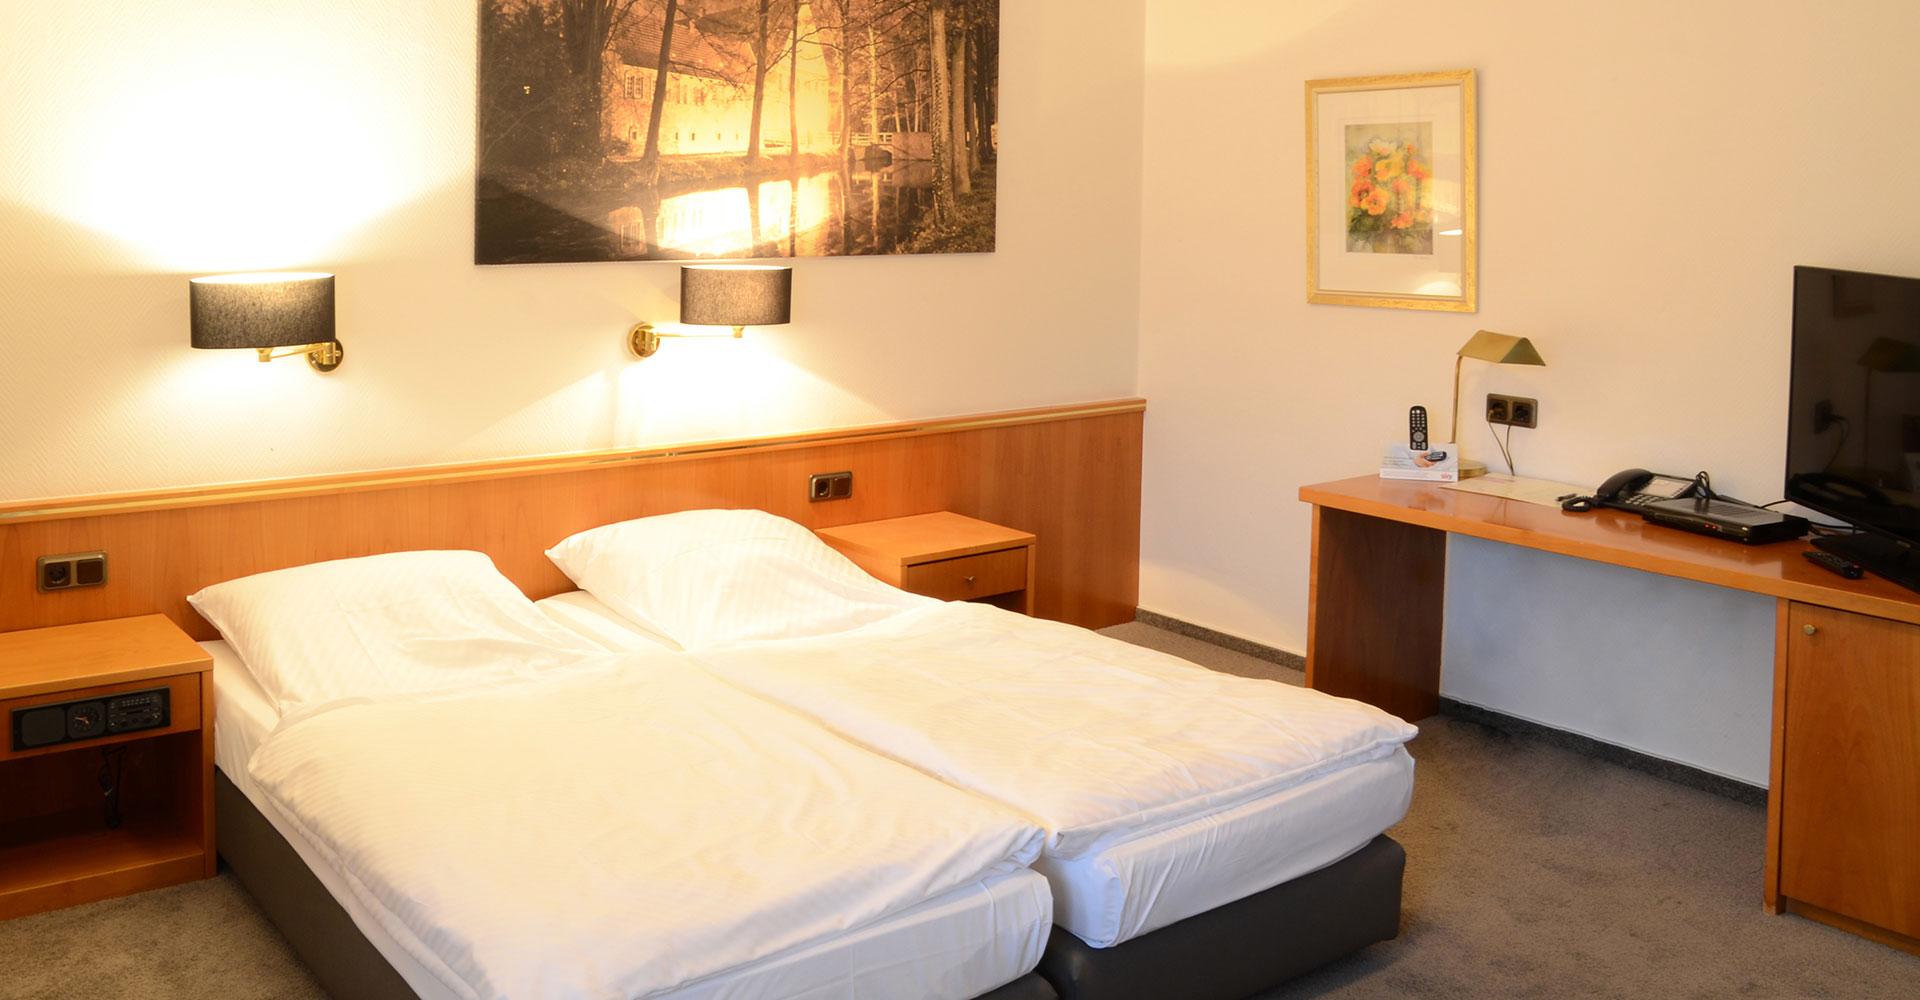 Standard Kategorie im Hotel Rheinischer Hof in Dinklage